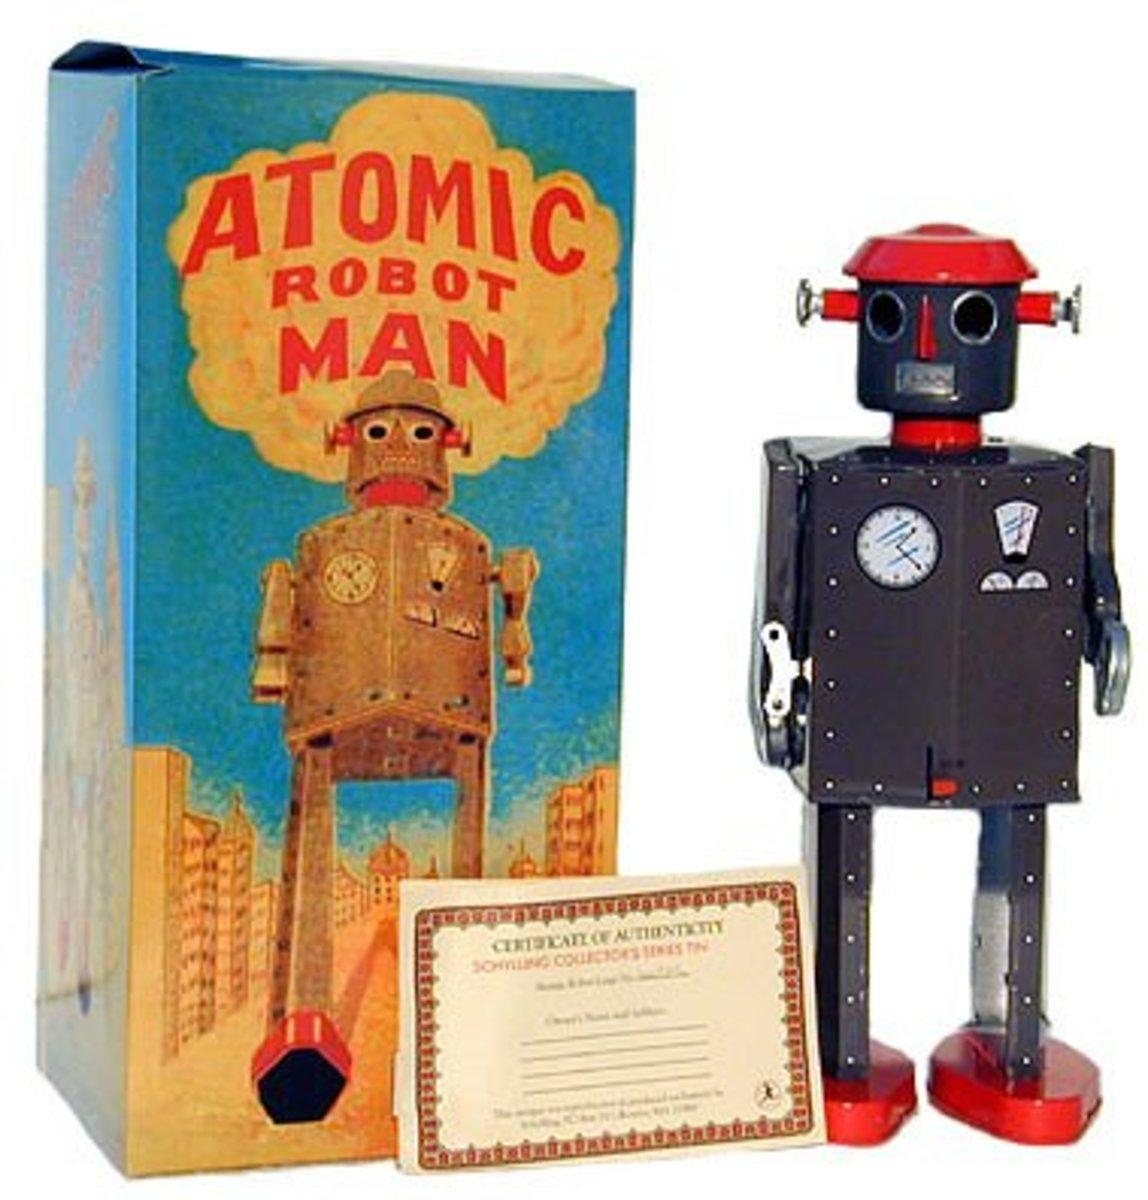 A reproduction. The original Atomic men had tan coloured bodies.